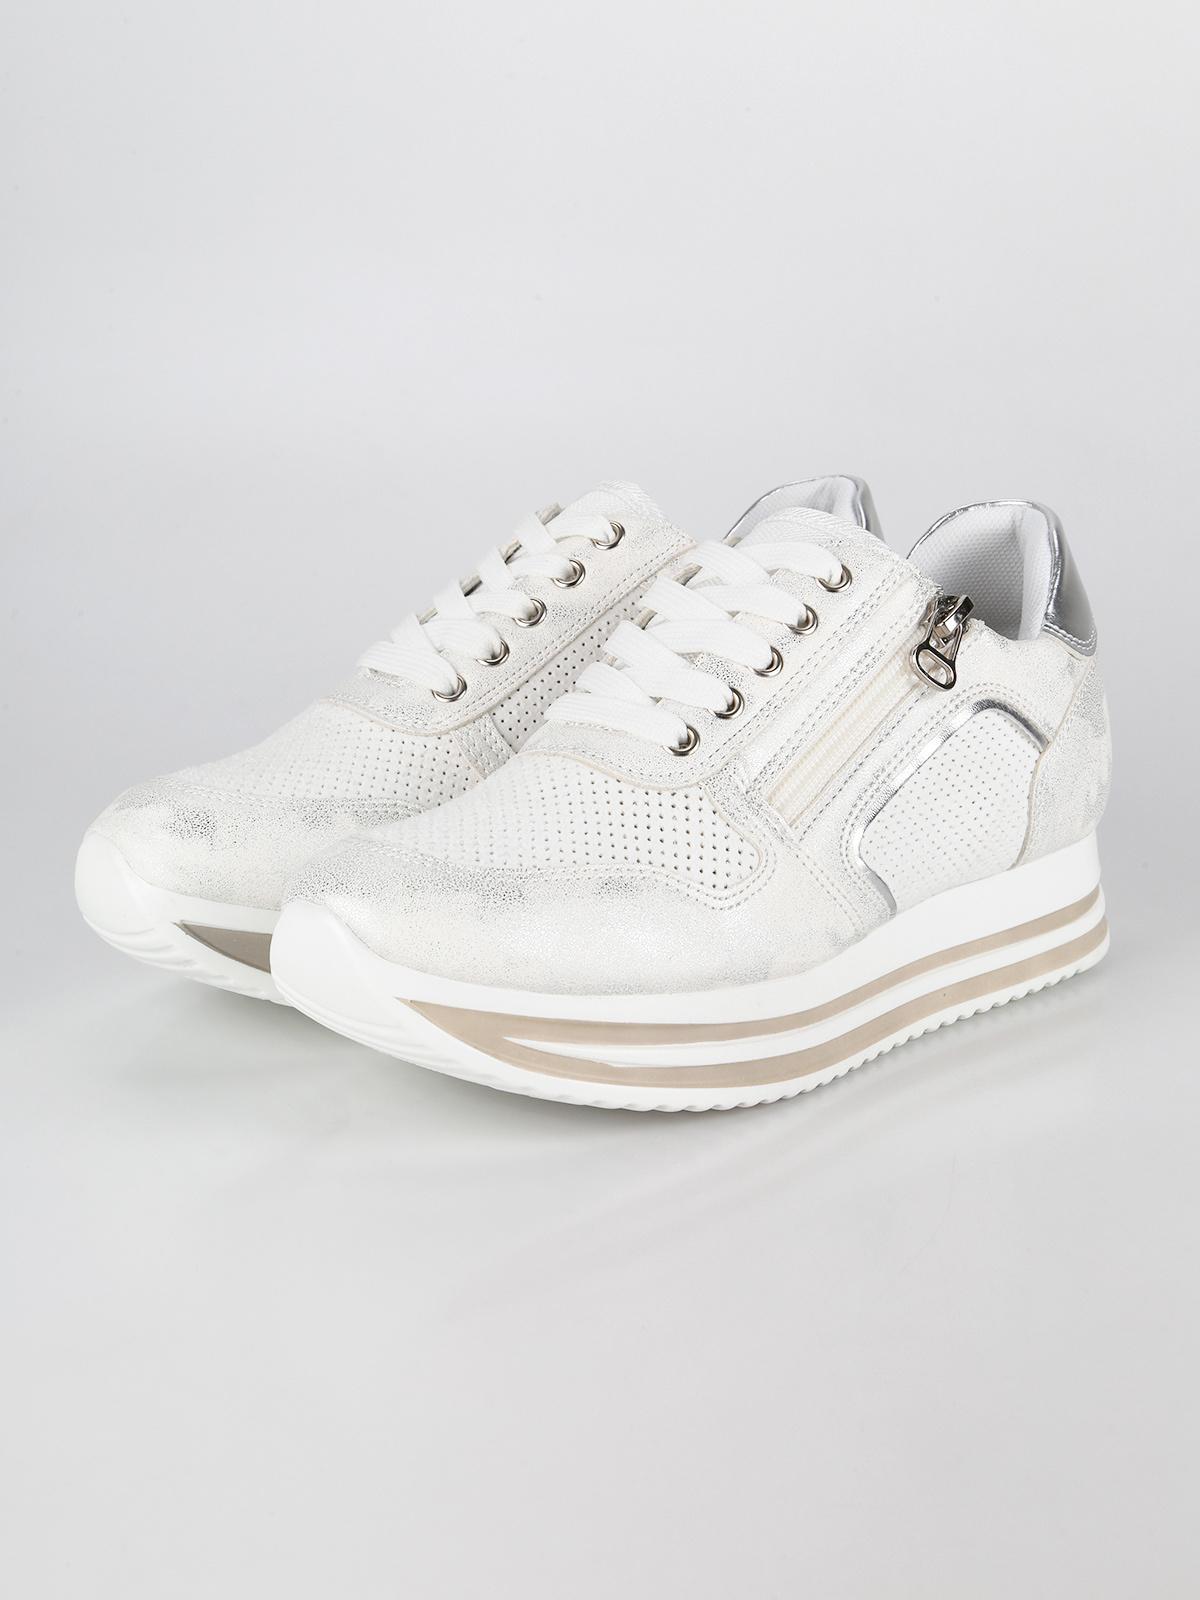 f1a5d8dbf2 Scarpe casual con zeppa interna energy footwear | MecShopping